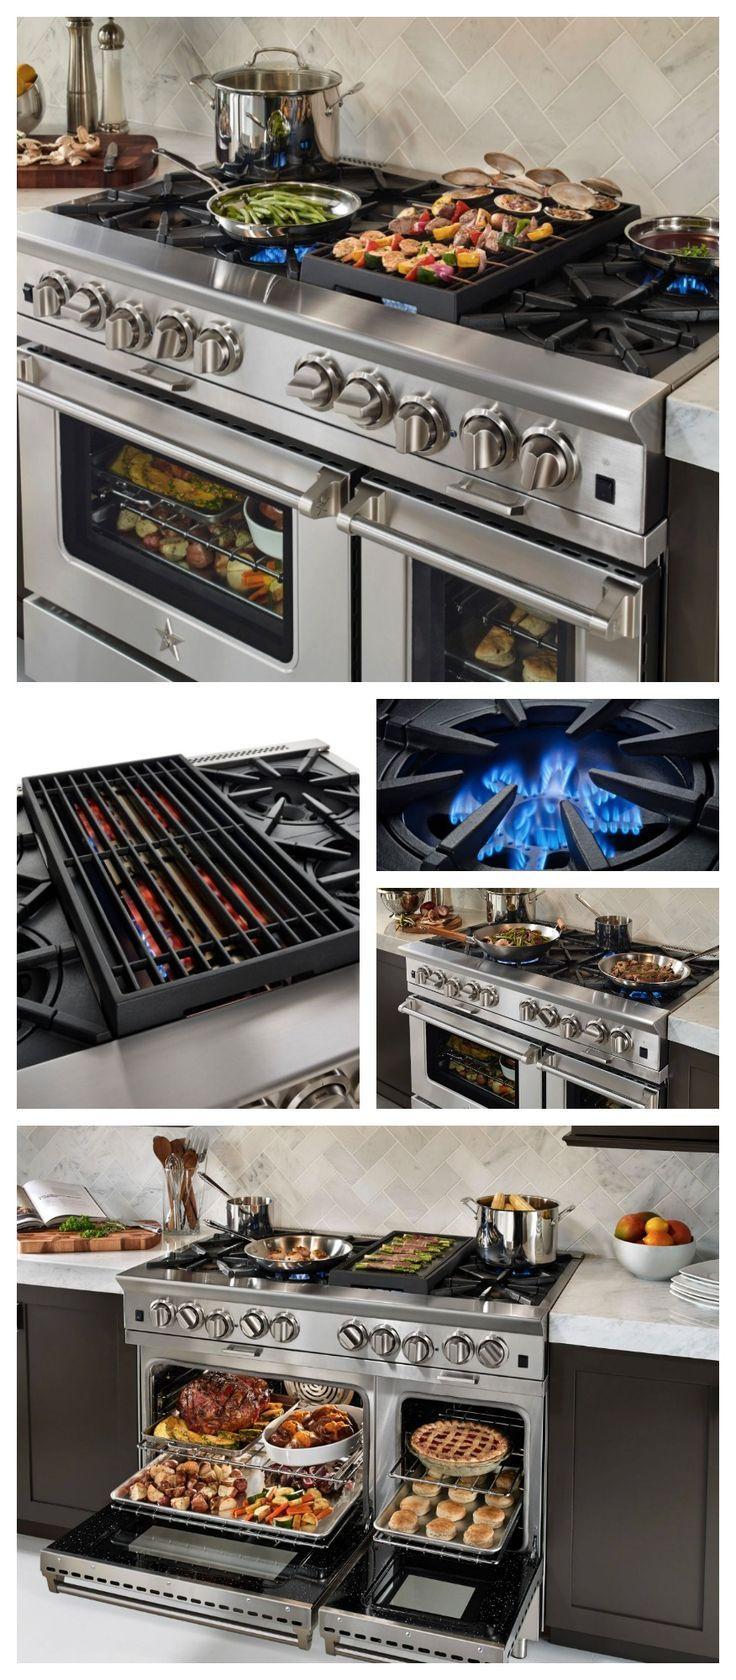 48 Platinum Series Gas Range Freestanding Range Kitchen Stove